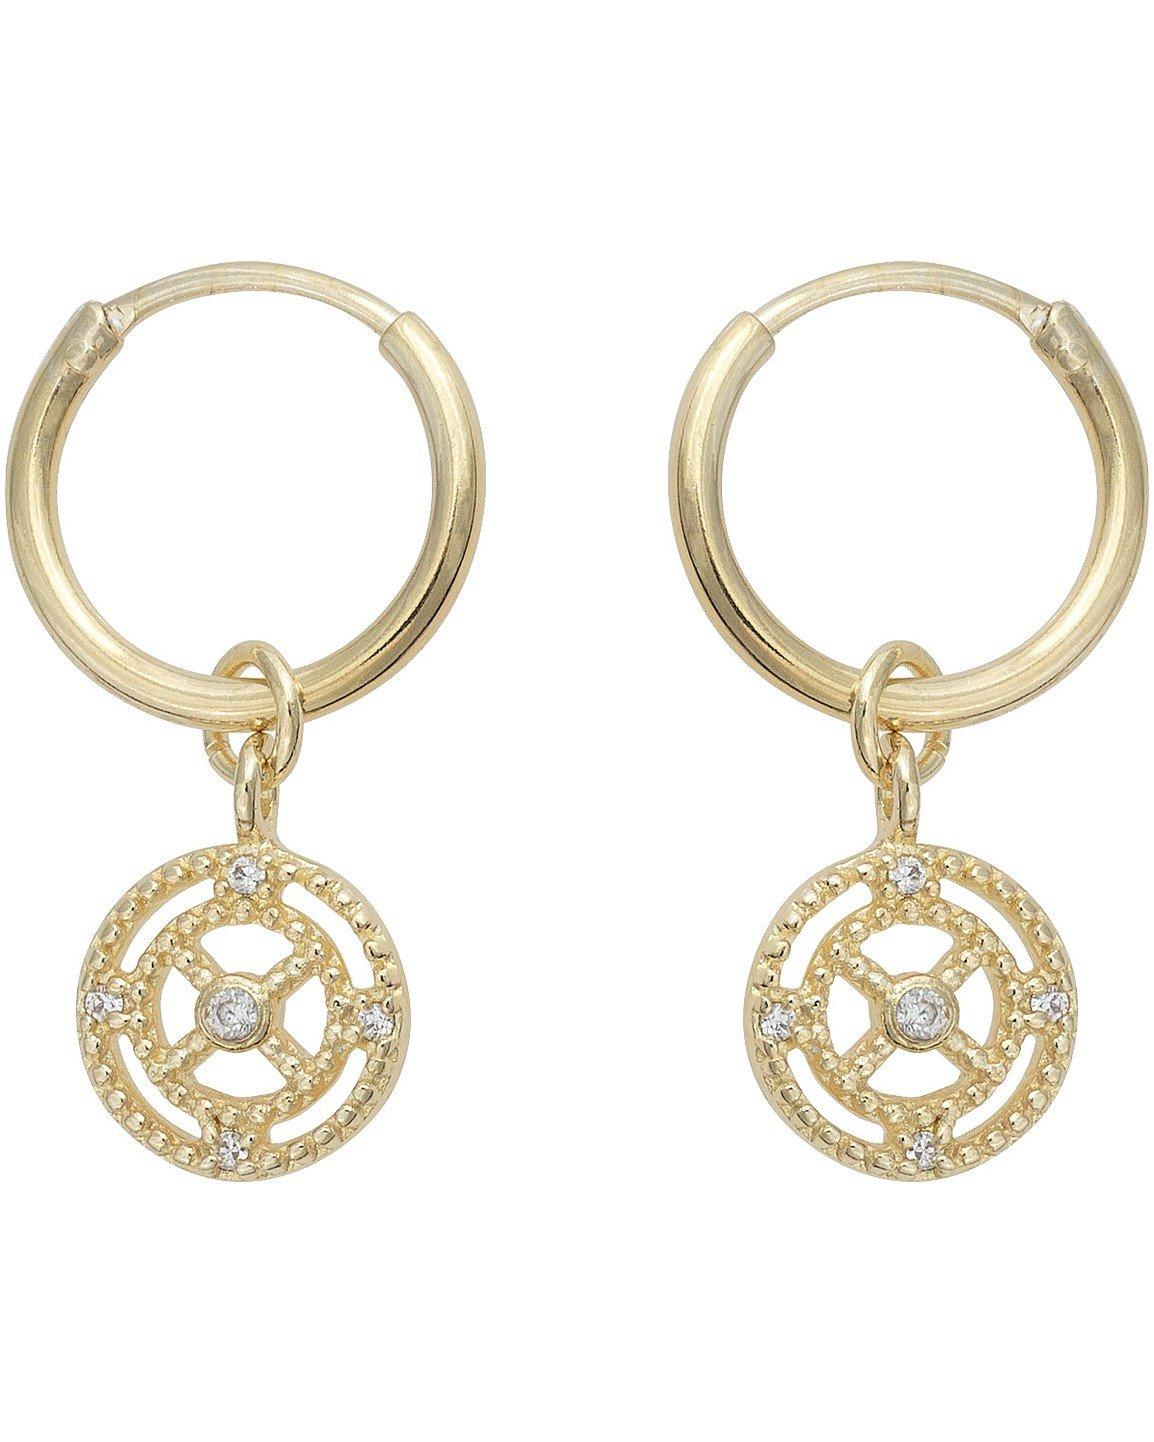 910b72ad1754a Earrings - Hoop Earrings, Gold & Silver Studs | Oliver Bonas